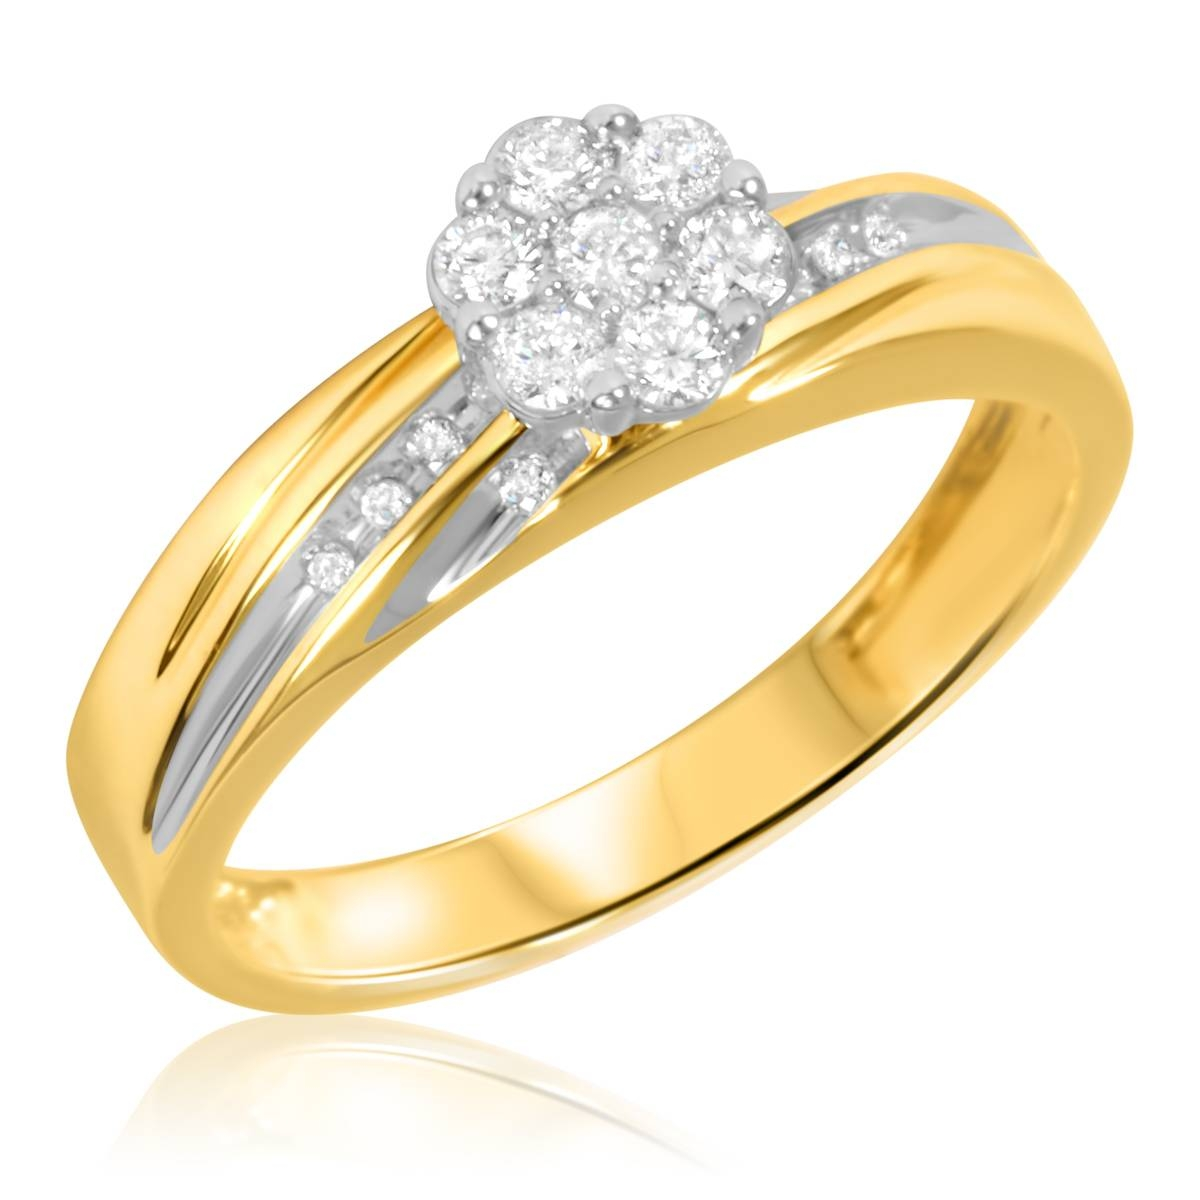 3/8 Carat T.w. Diamond Trio Matching Wedding Ring Set 14K Yellow Gold For 24K Gold Wedding Rings (Gallery 11 of 15)